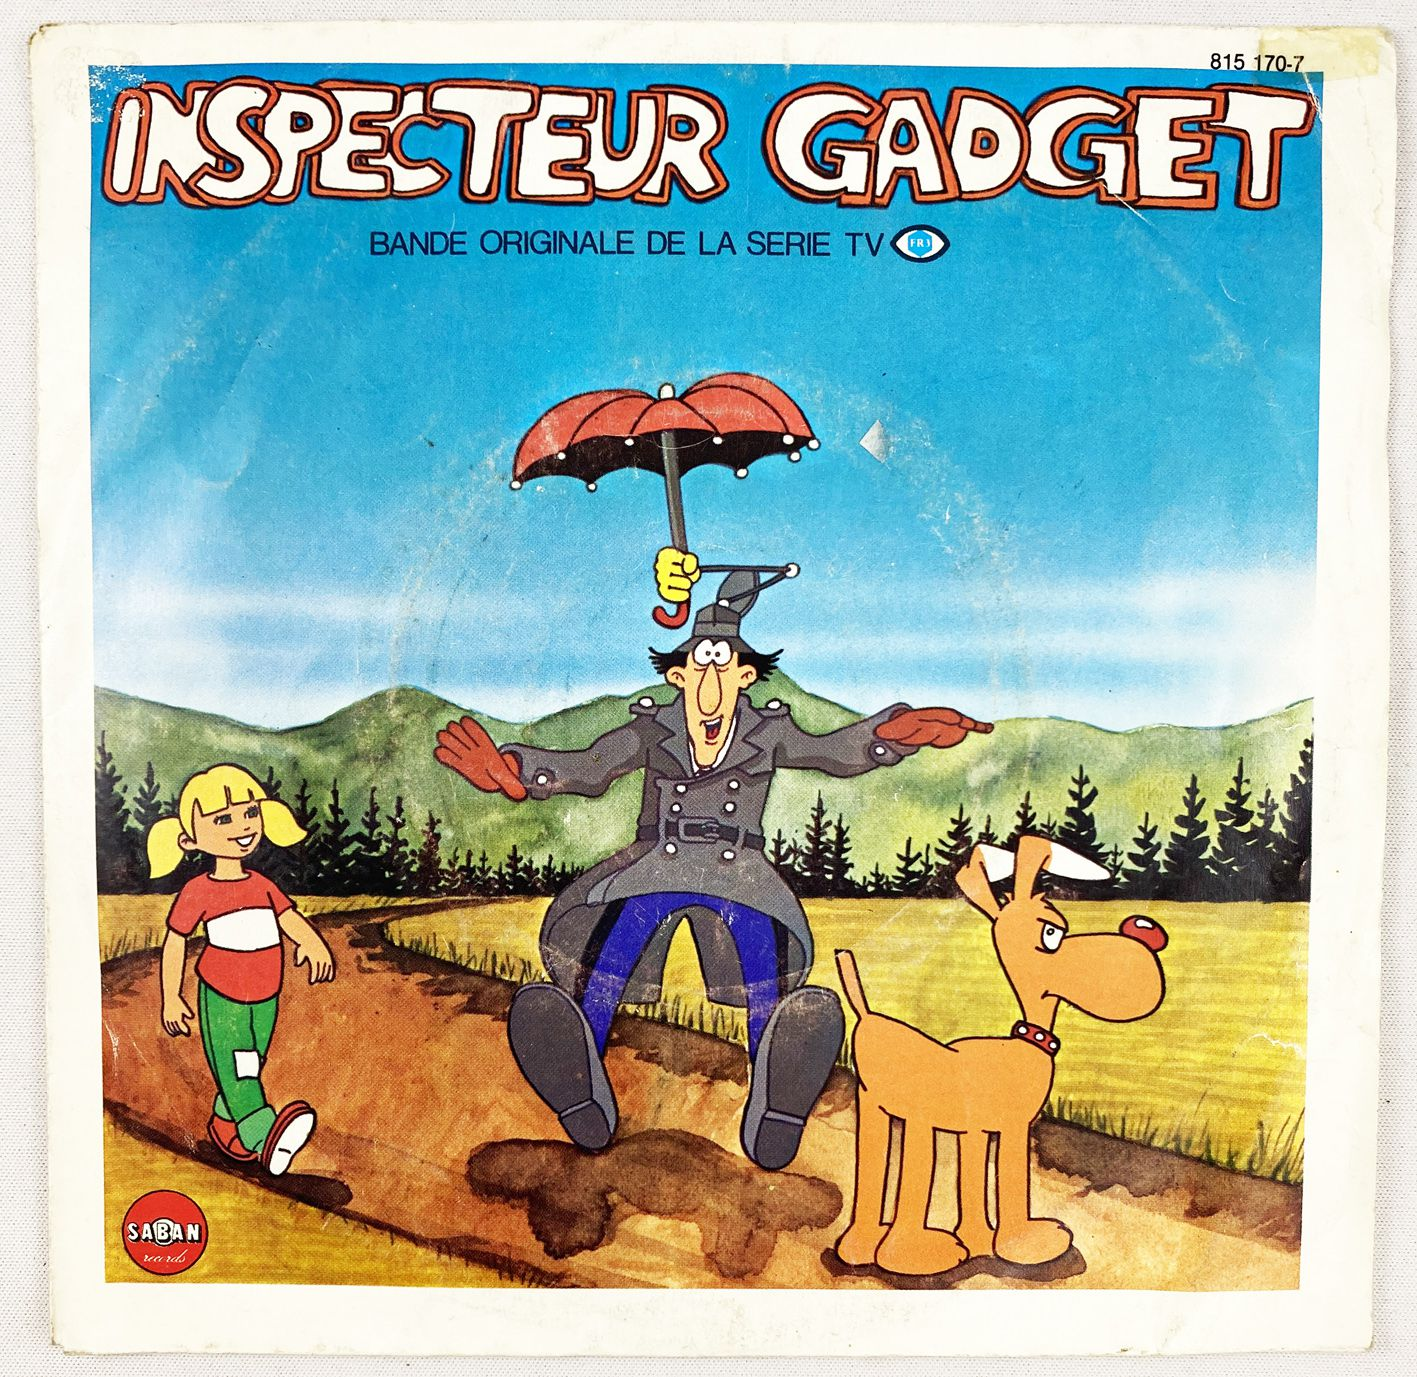 Inspector Gadget - Mini-LP Record - Original French TV series Soundtrack - Saban Records 1983